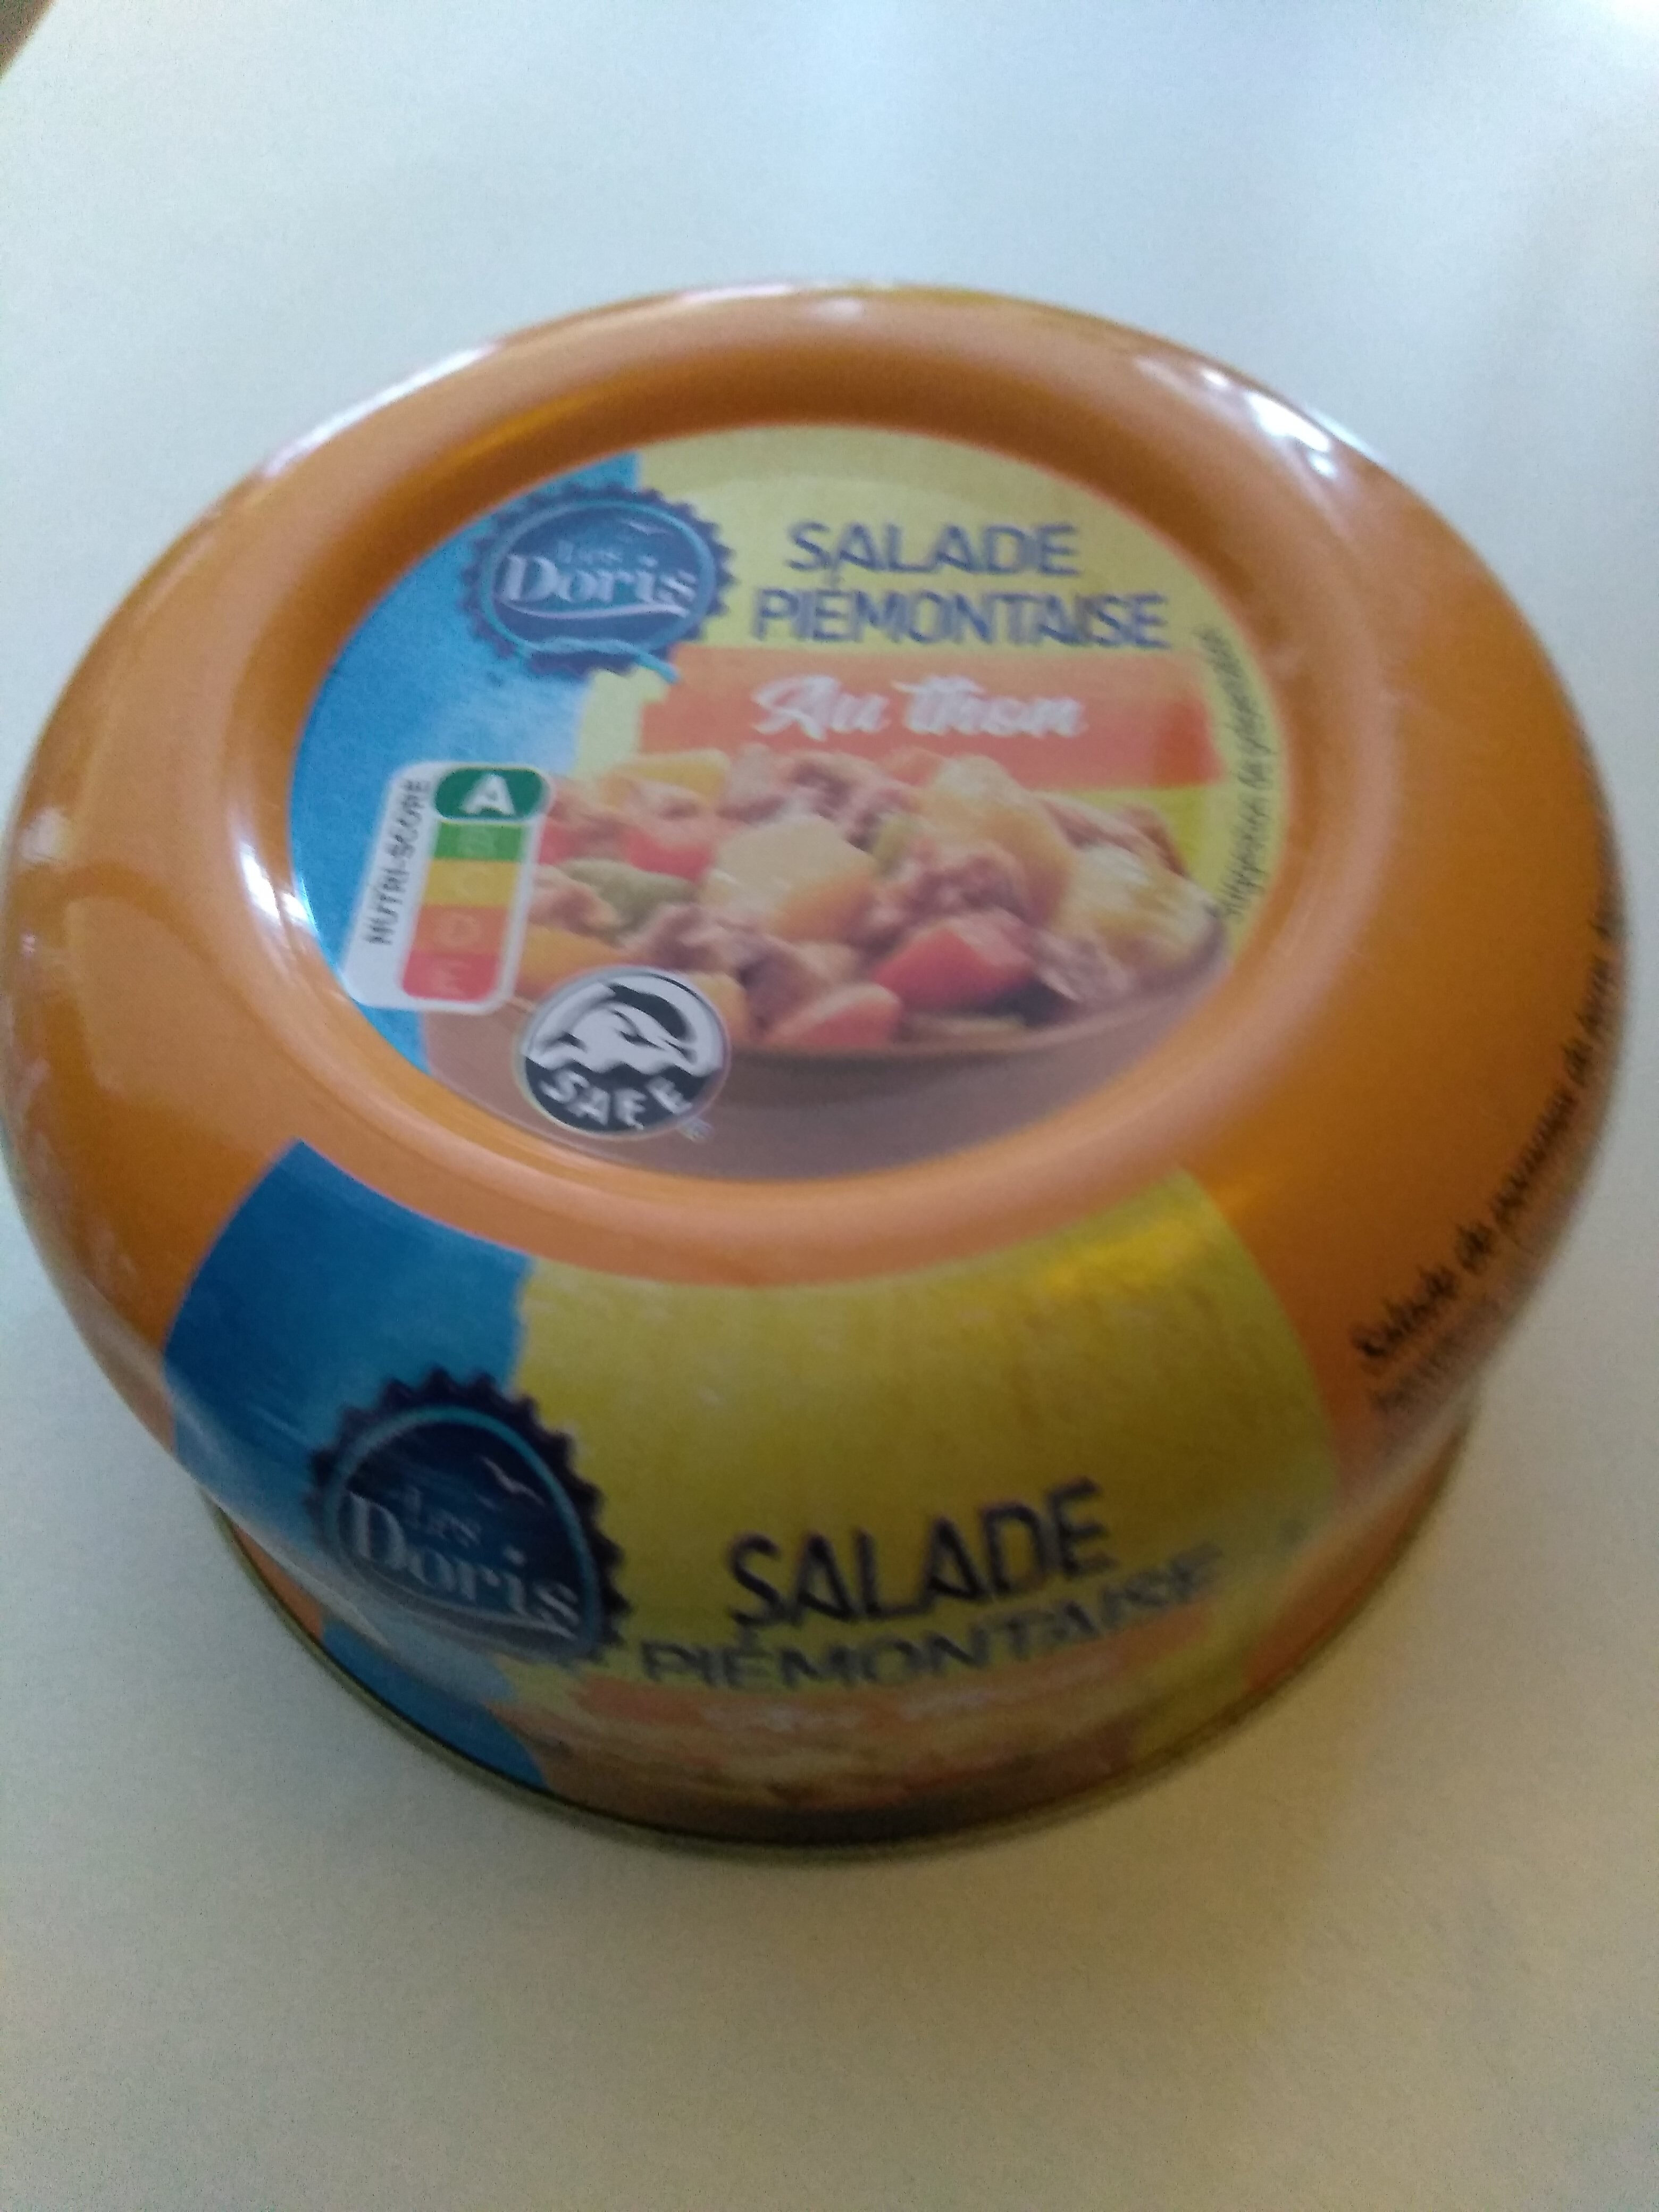 Salade Piémontaise au thon - Produit - fr